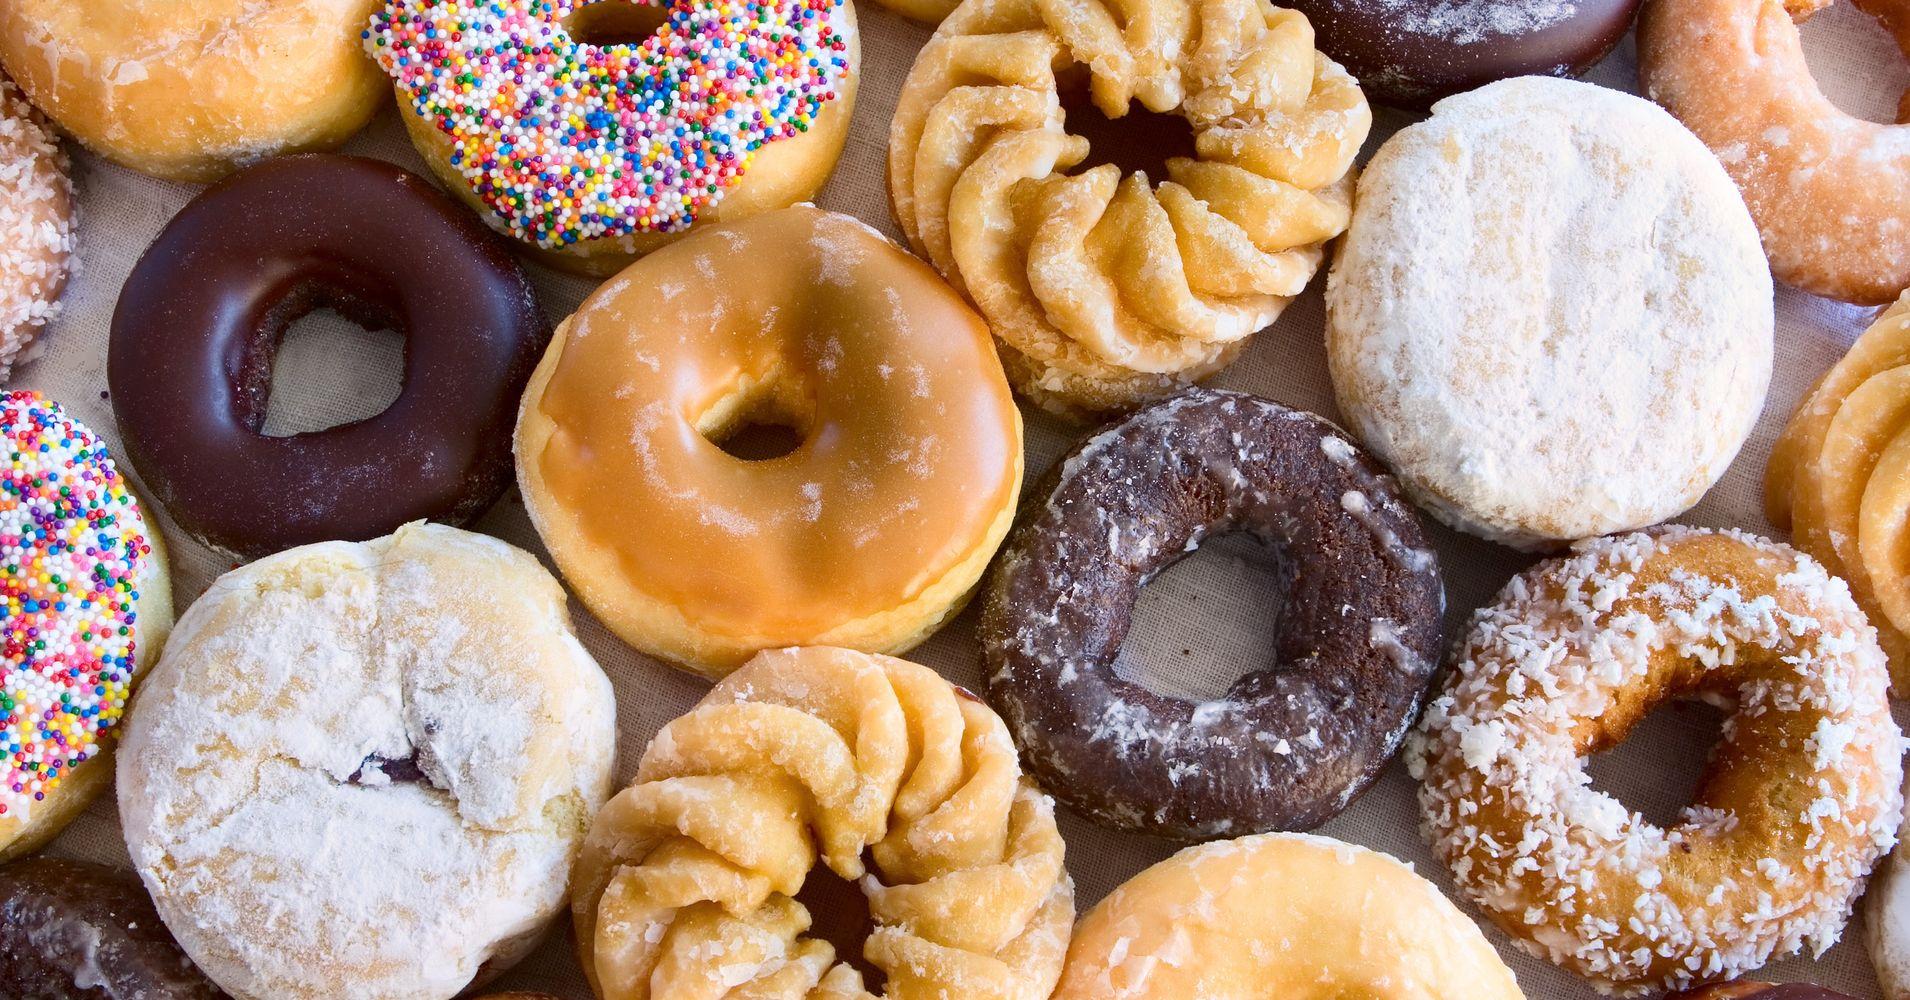 Sugar In Old Fashioned Donut